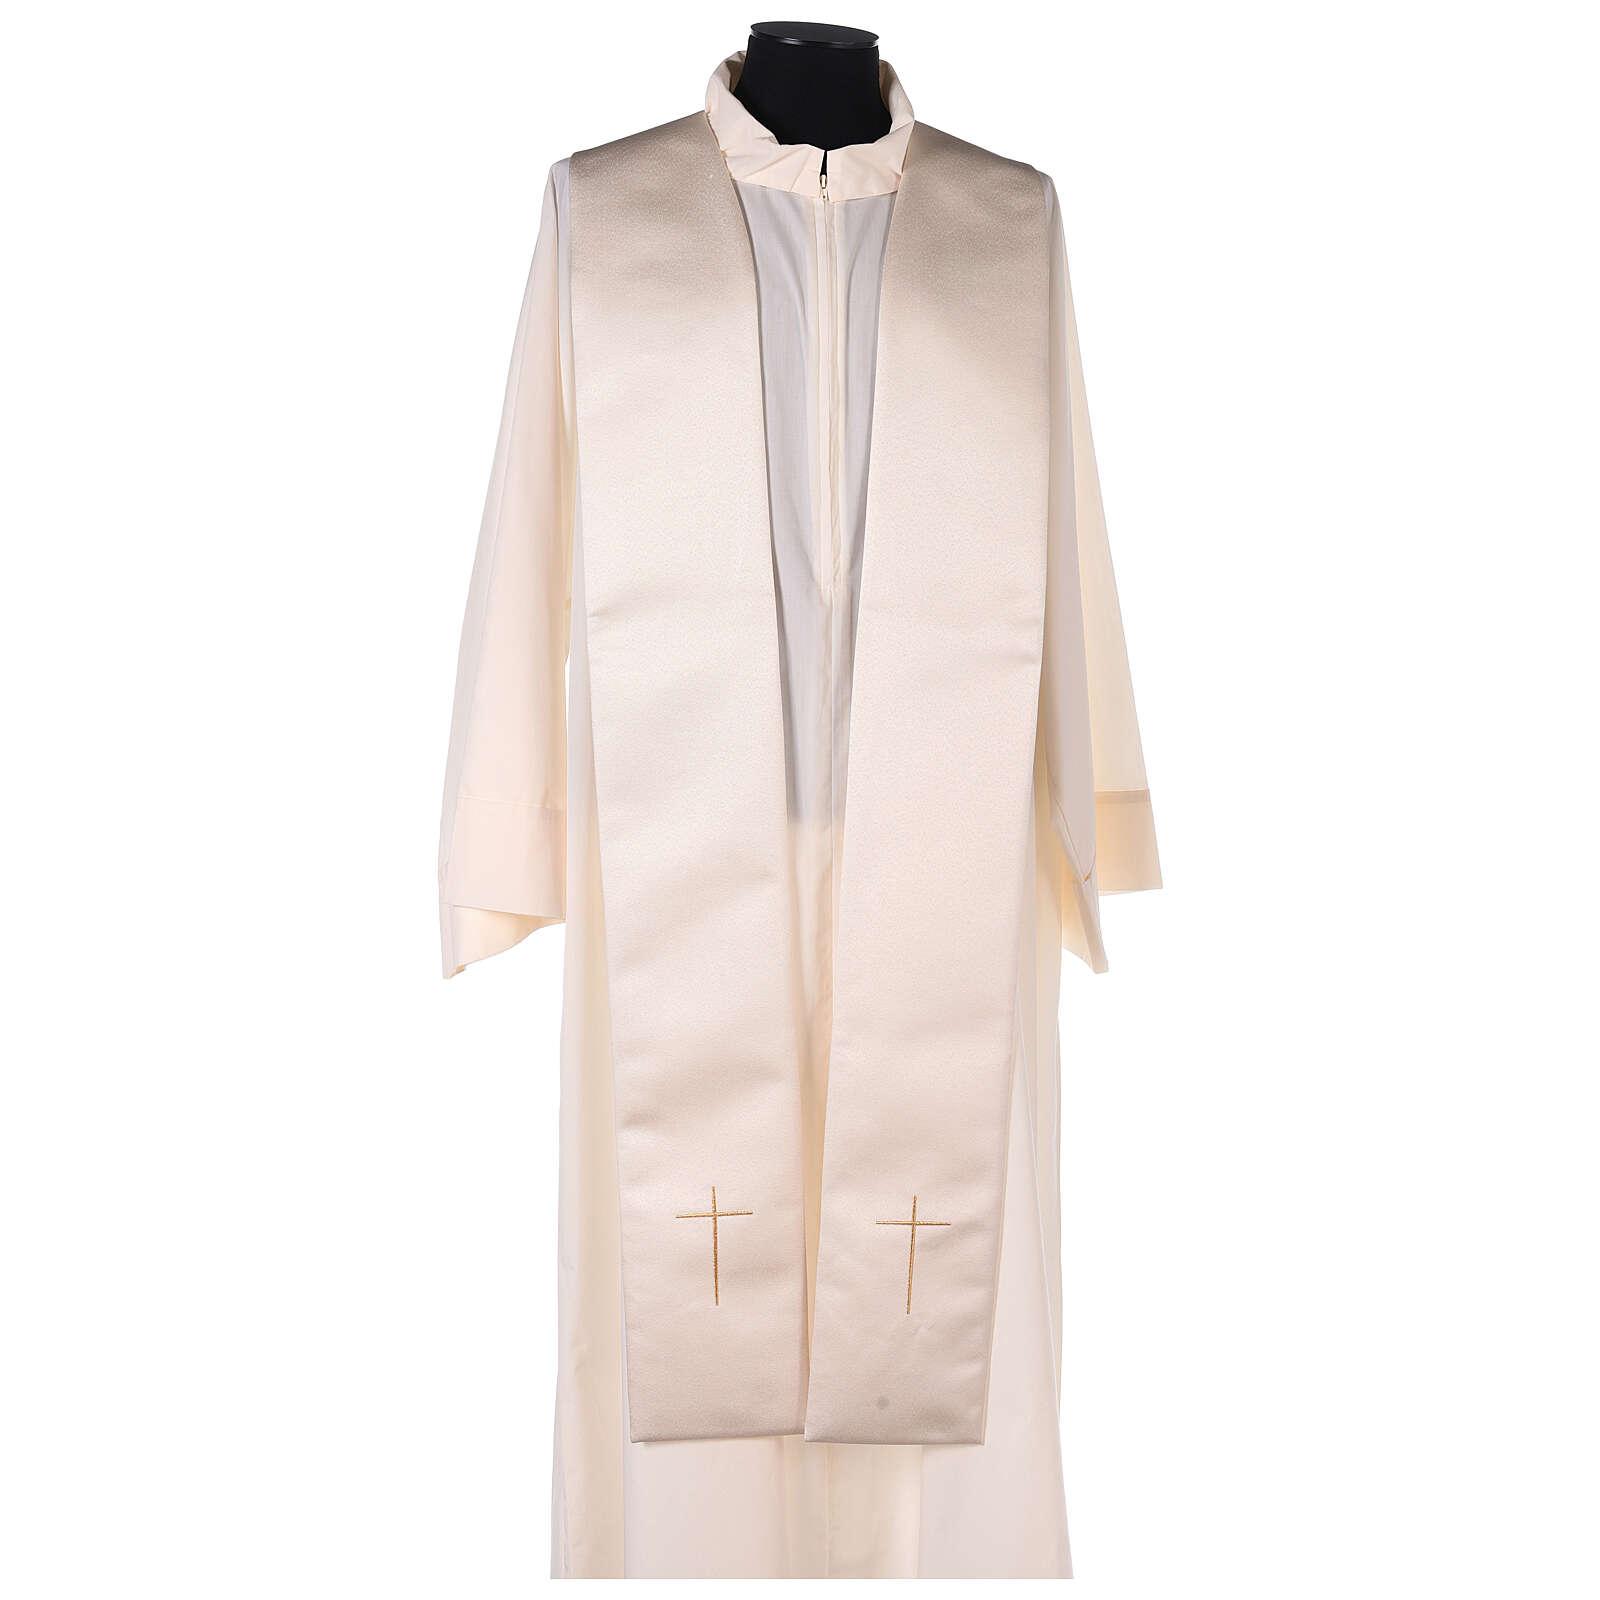 Capa pluvial 80% poliéster blanca nata detalles dorados florales JHS 4